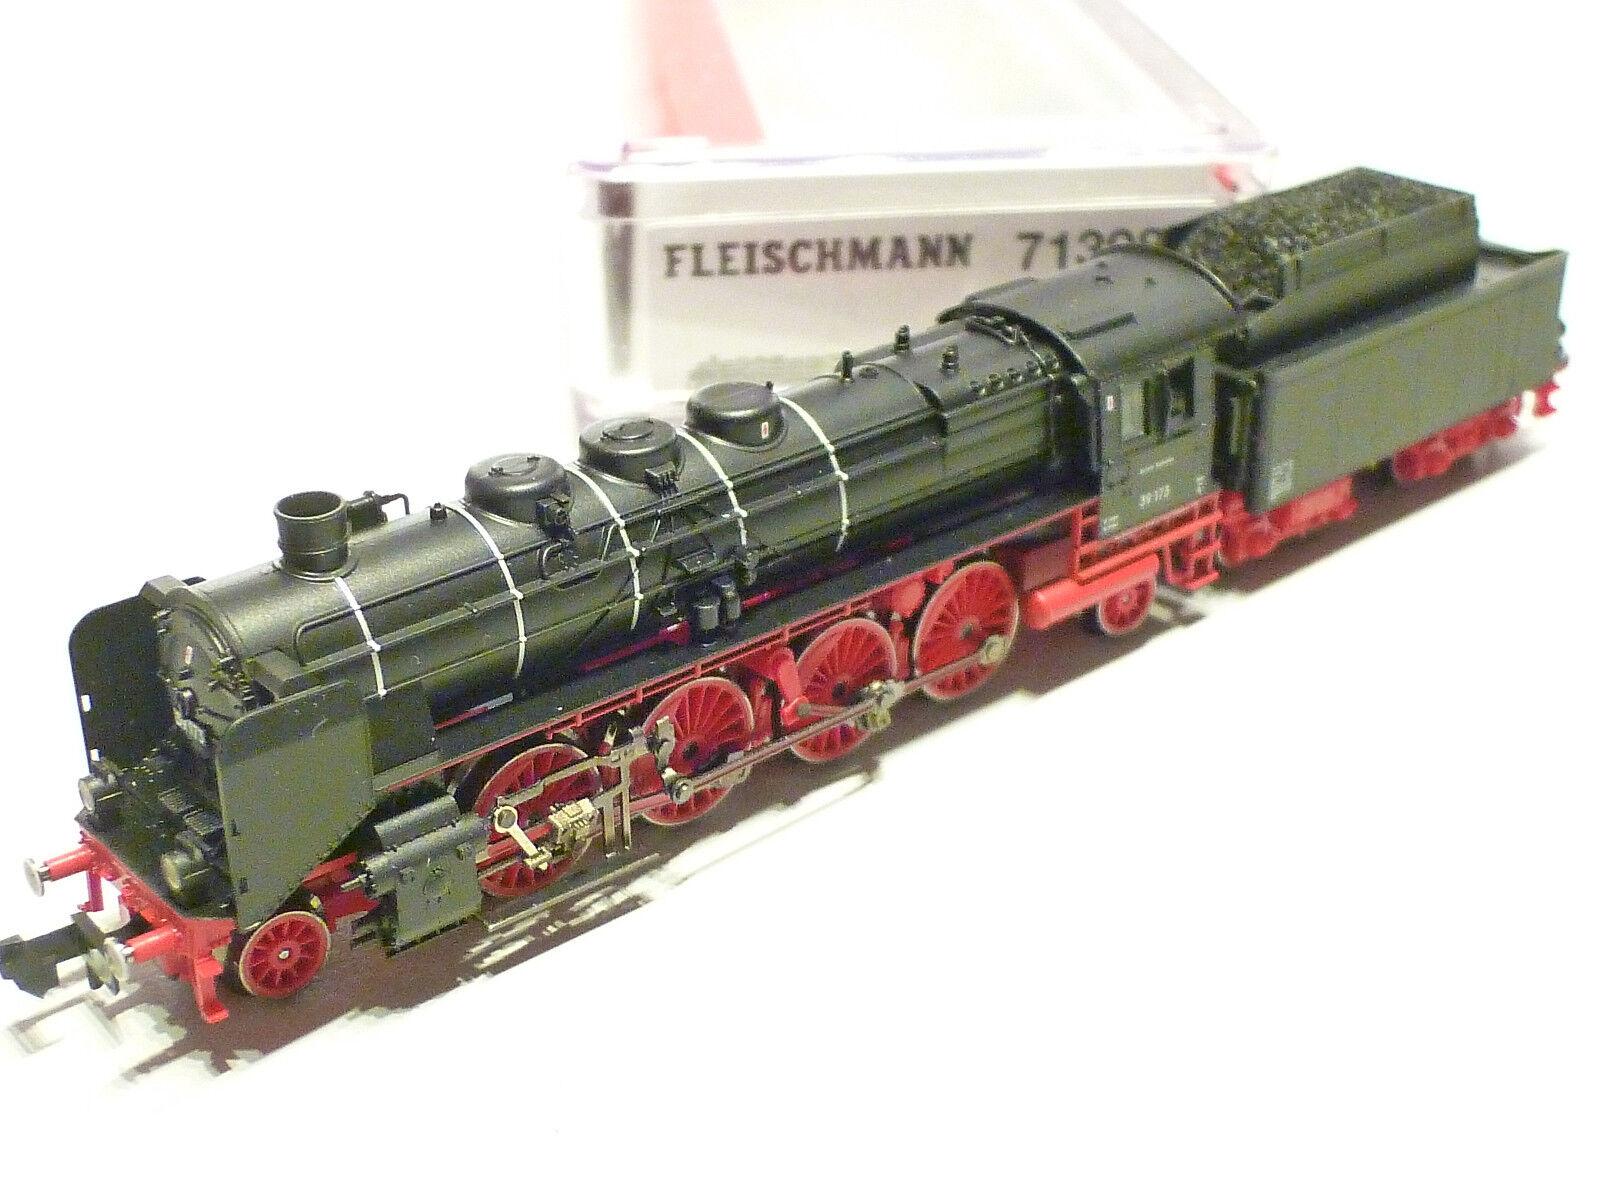 Fleischmann N DB 39 179 black 713901 NEU OVP